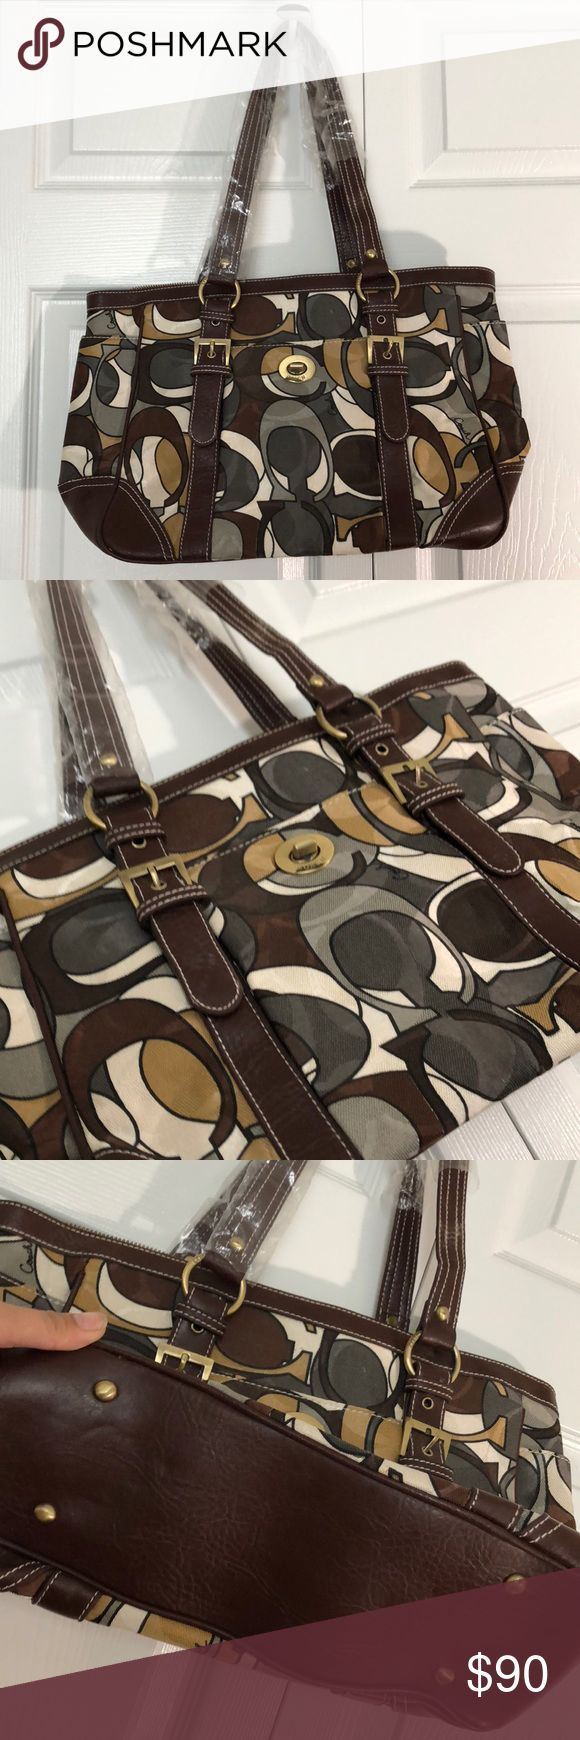 New COACH handbag New coach handbag. Leather and never used Coach Bags Shoulder Bags